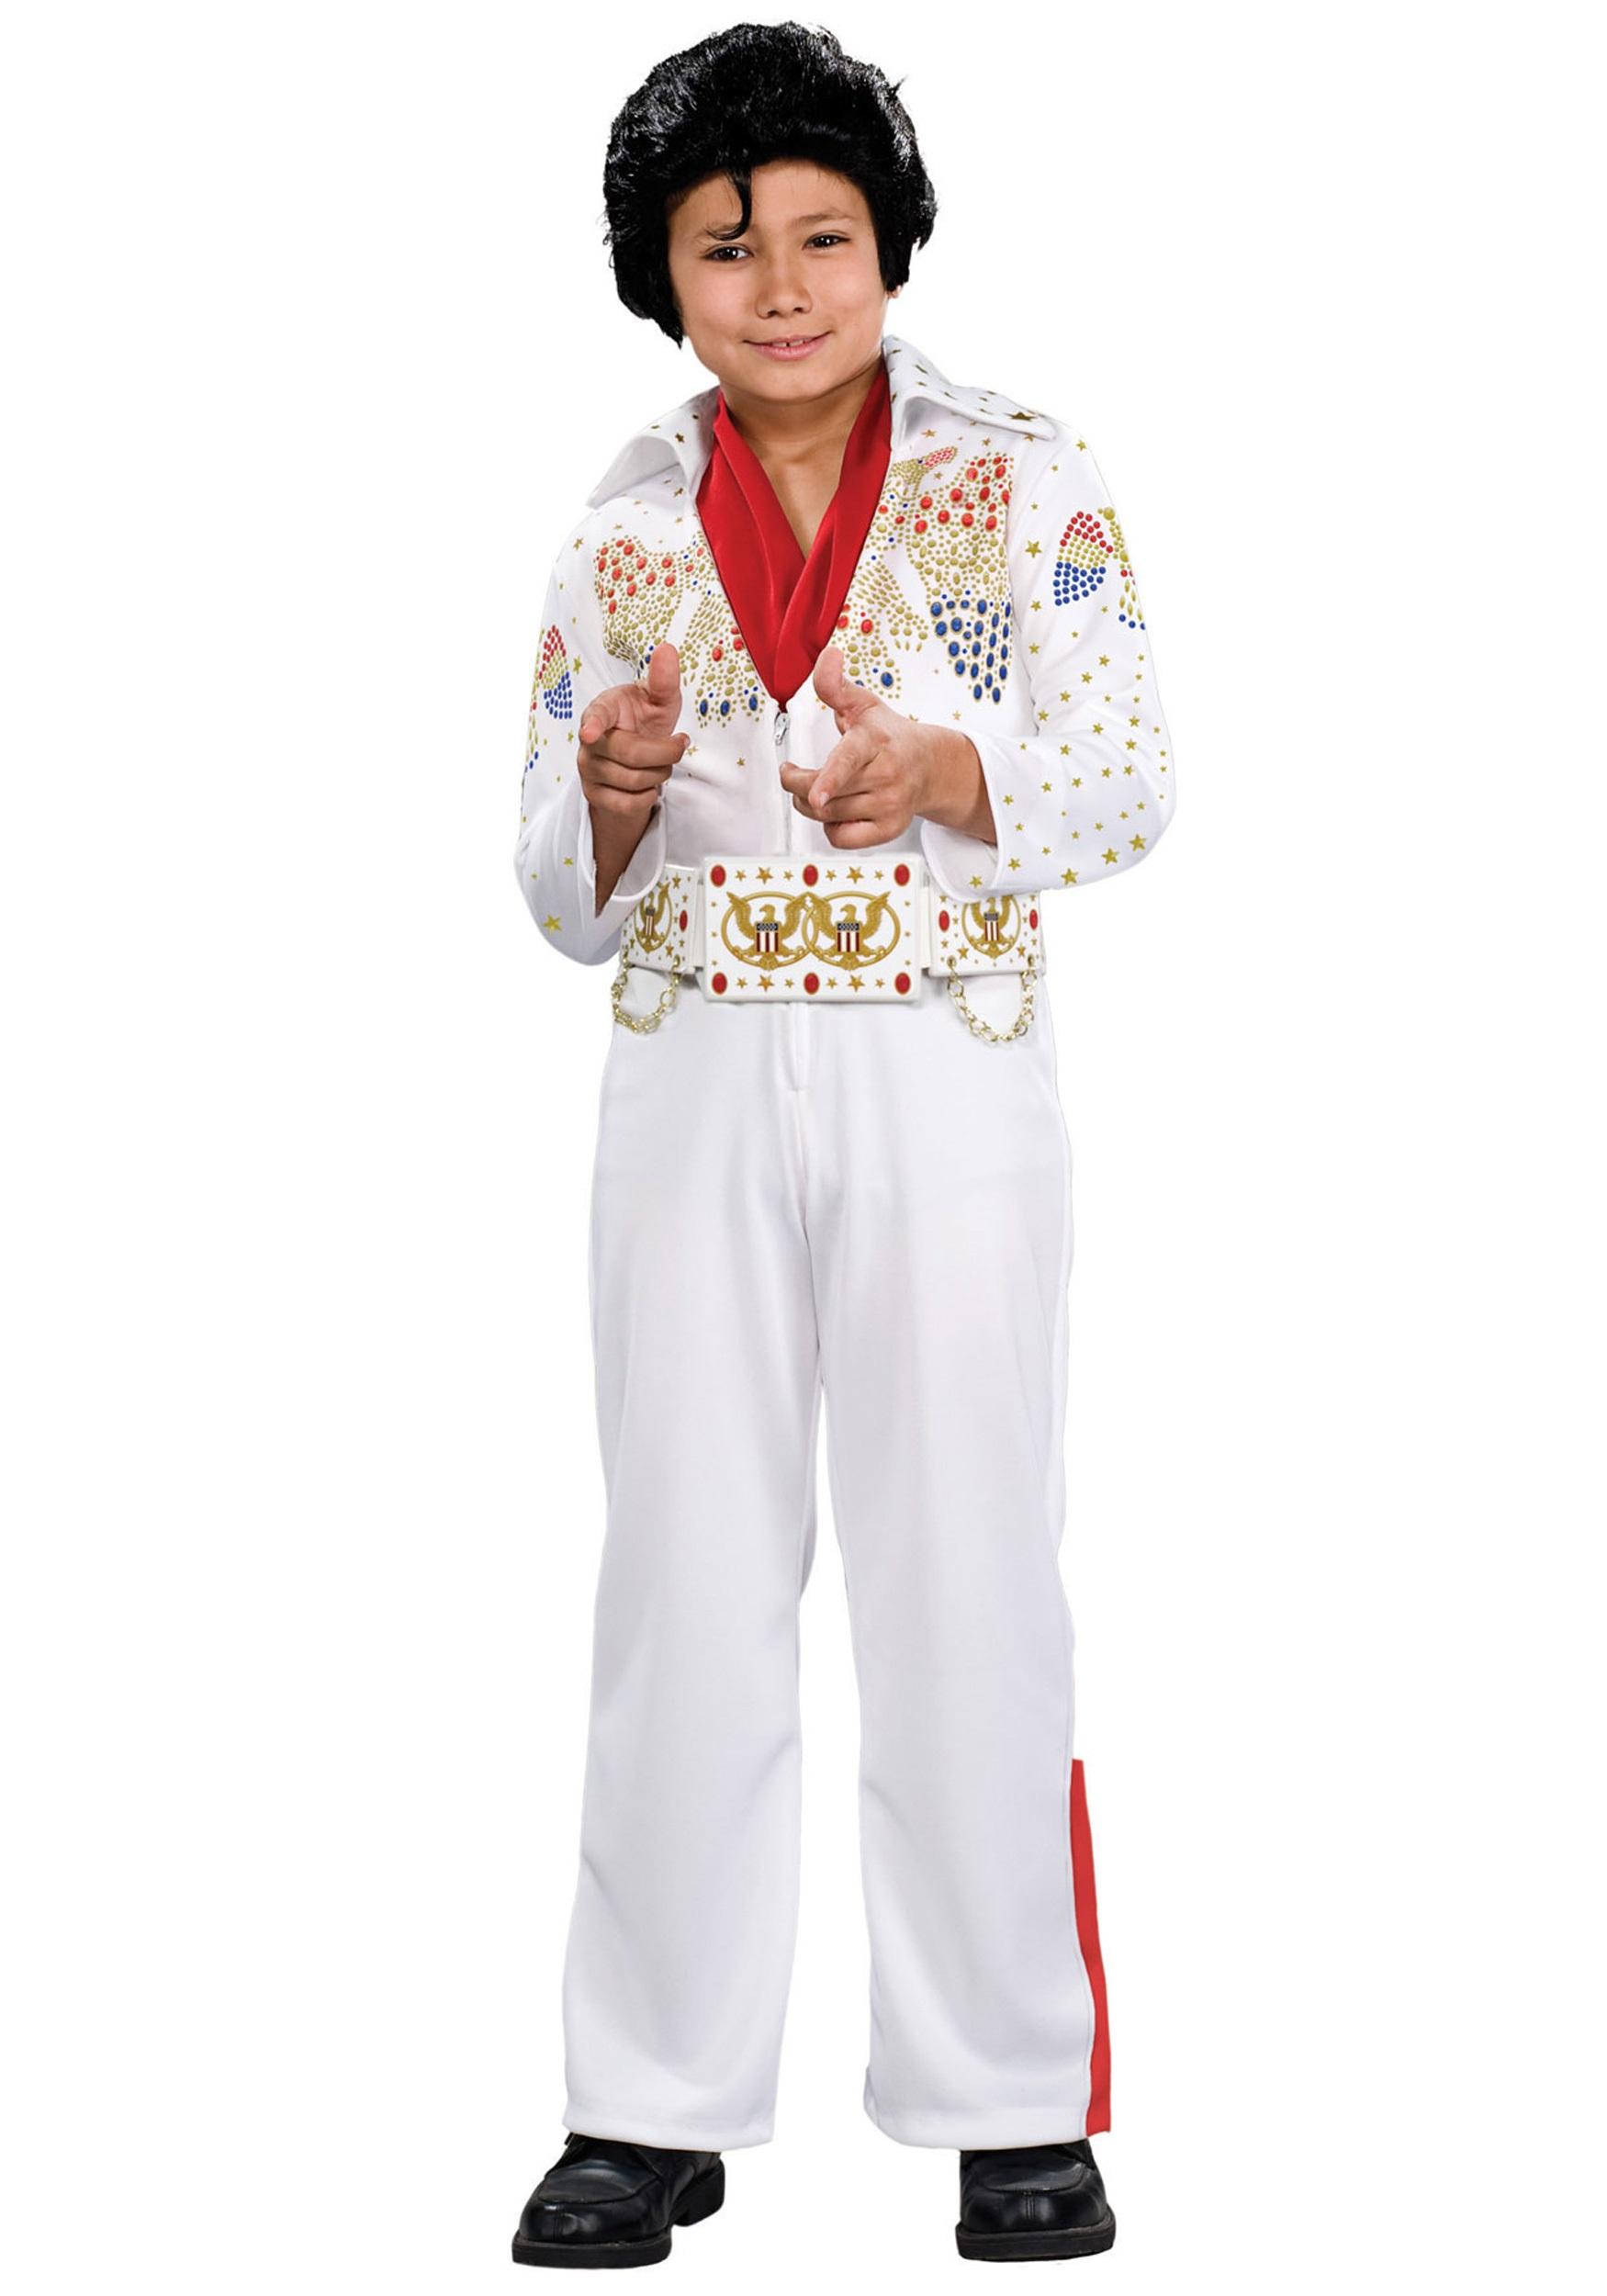 sc 1 st  Halloween Costumes & Deluxe Child Elvis Costume